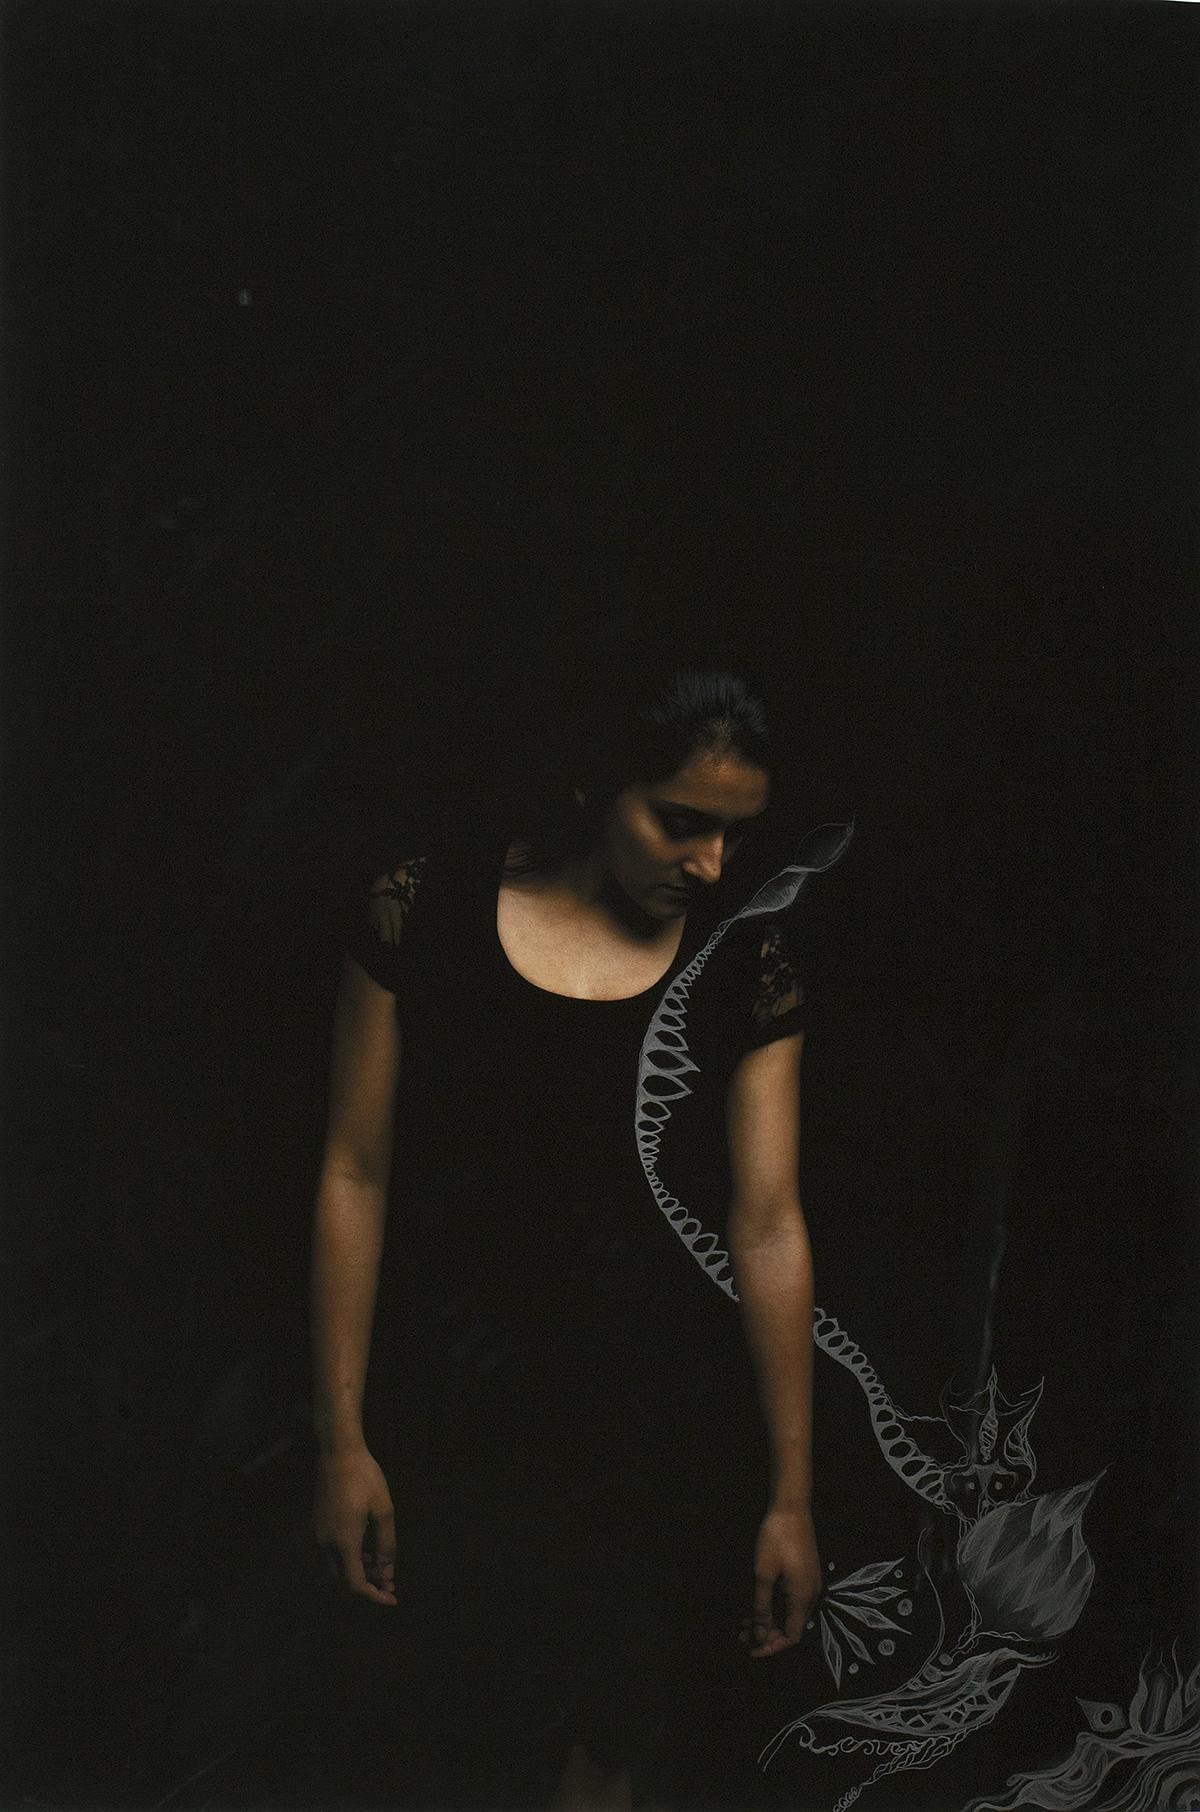 Alondra Ruiz-Hernandez